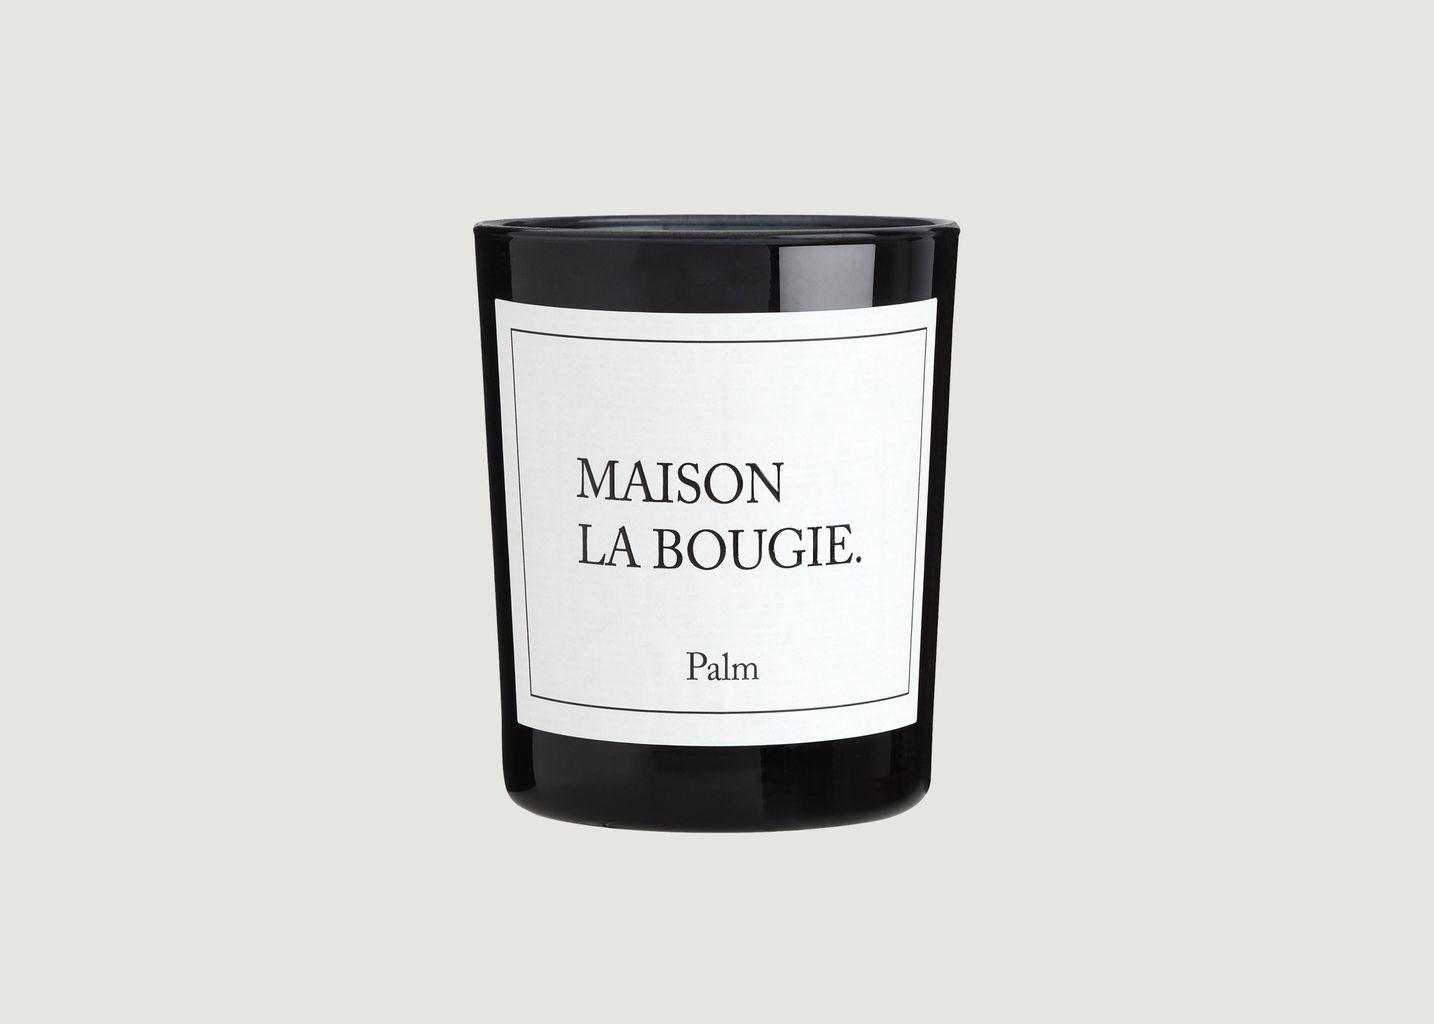 Bougie 190g Palm - Maison La Bougie